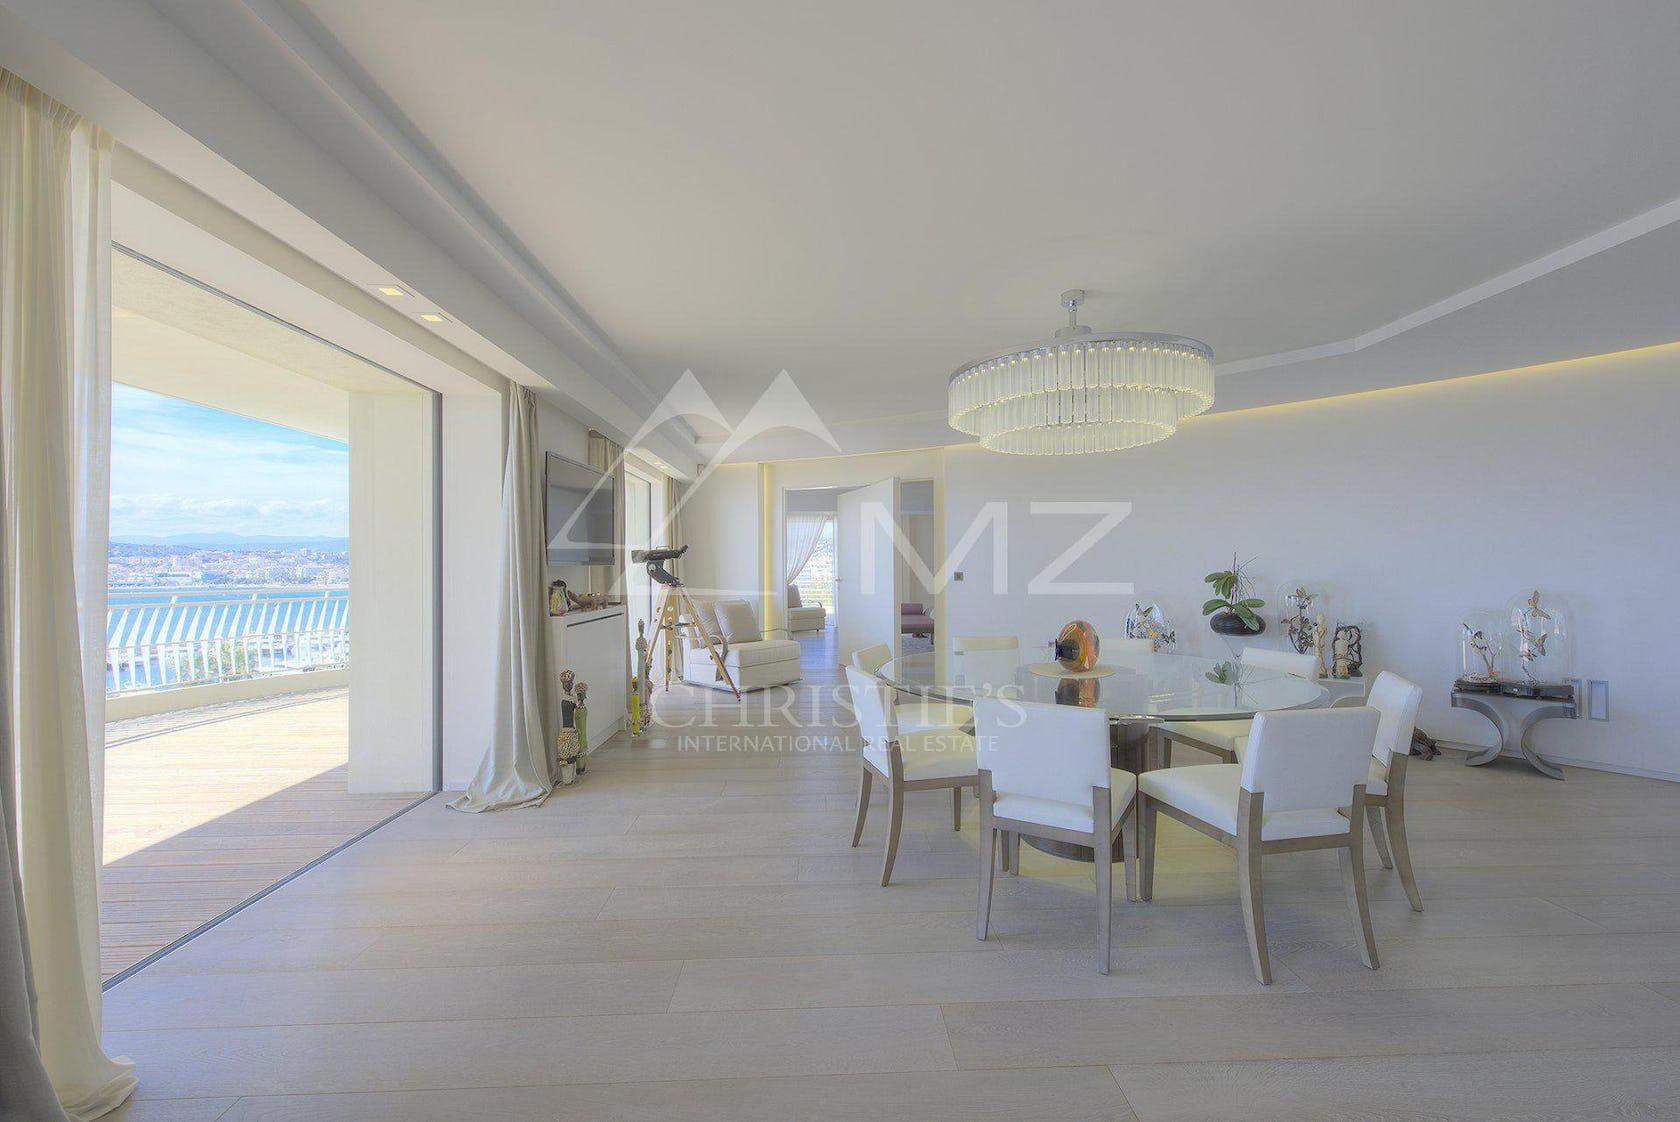 flooring floor chair furniture indoors room interior design dining table table